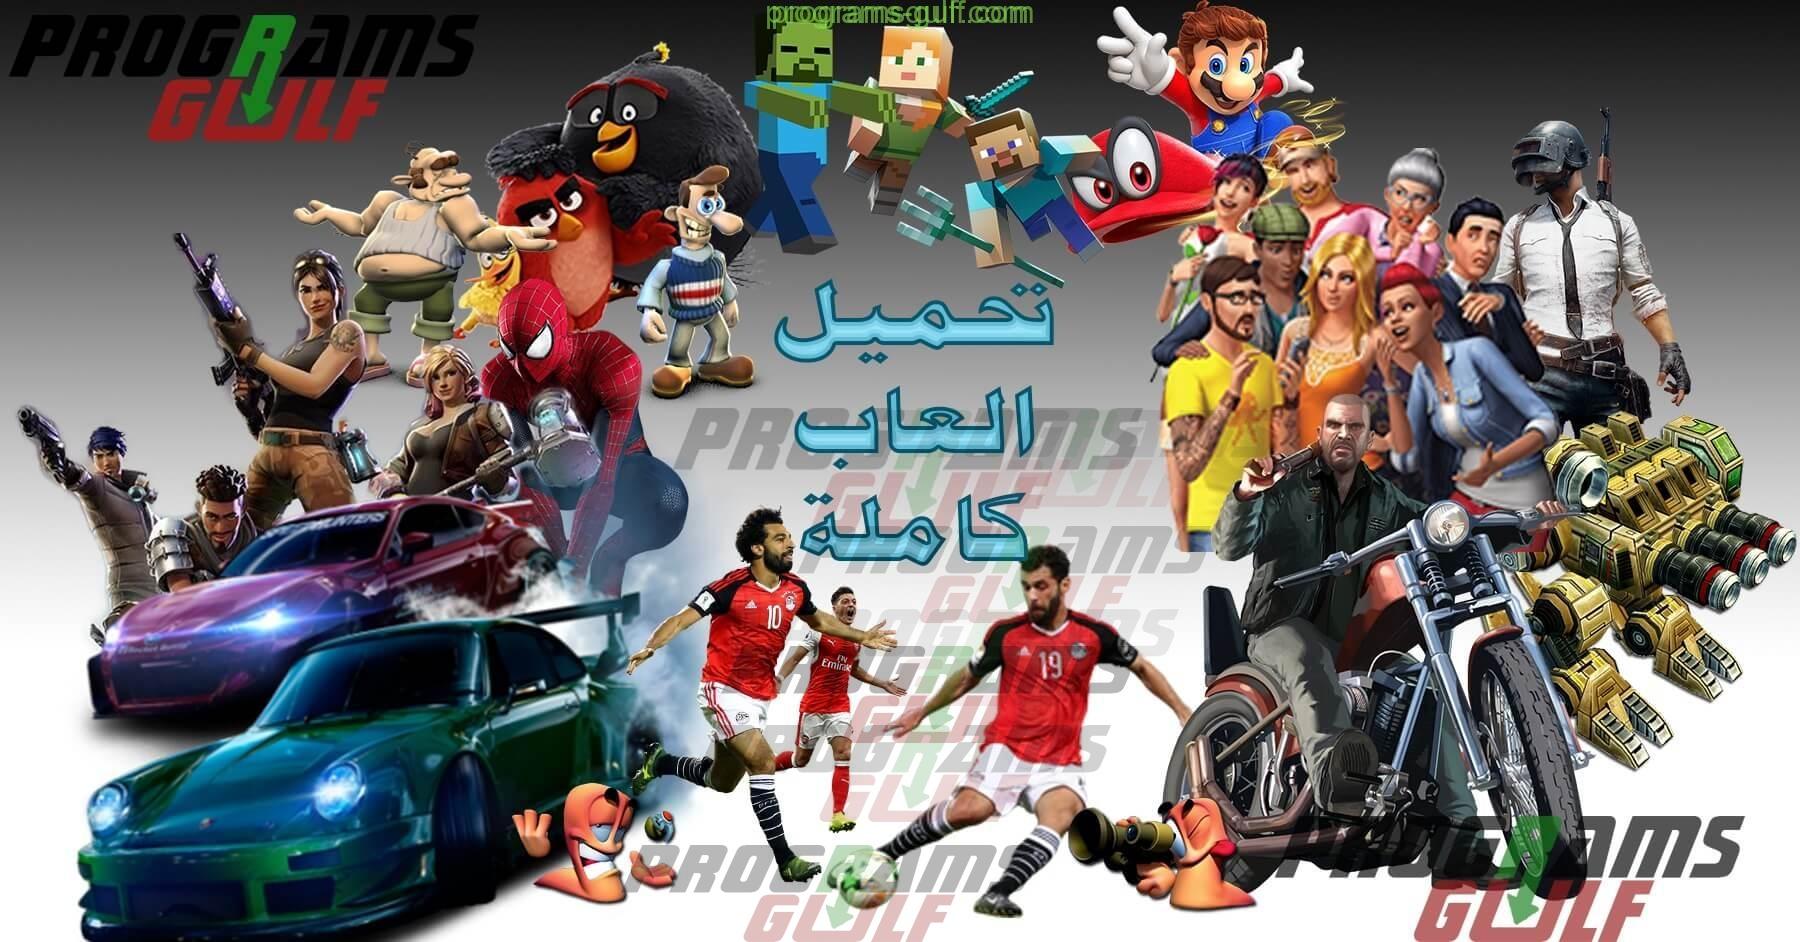 Photo of تحميل العاب كمبيوتر 2019 مجانا